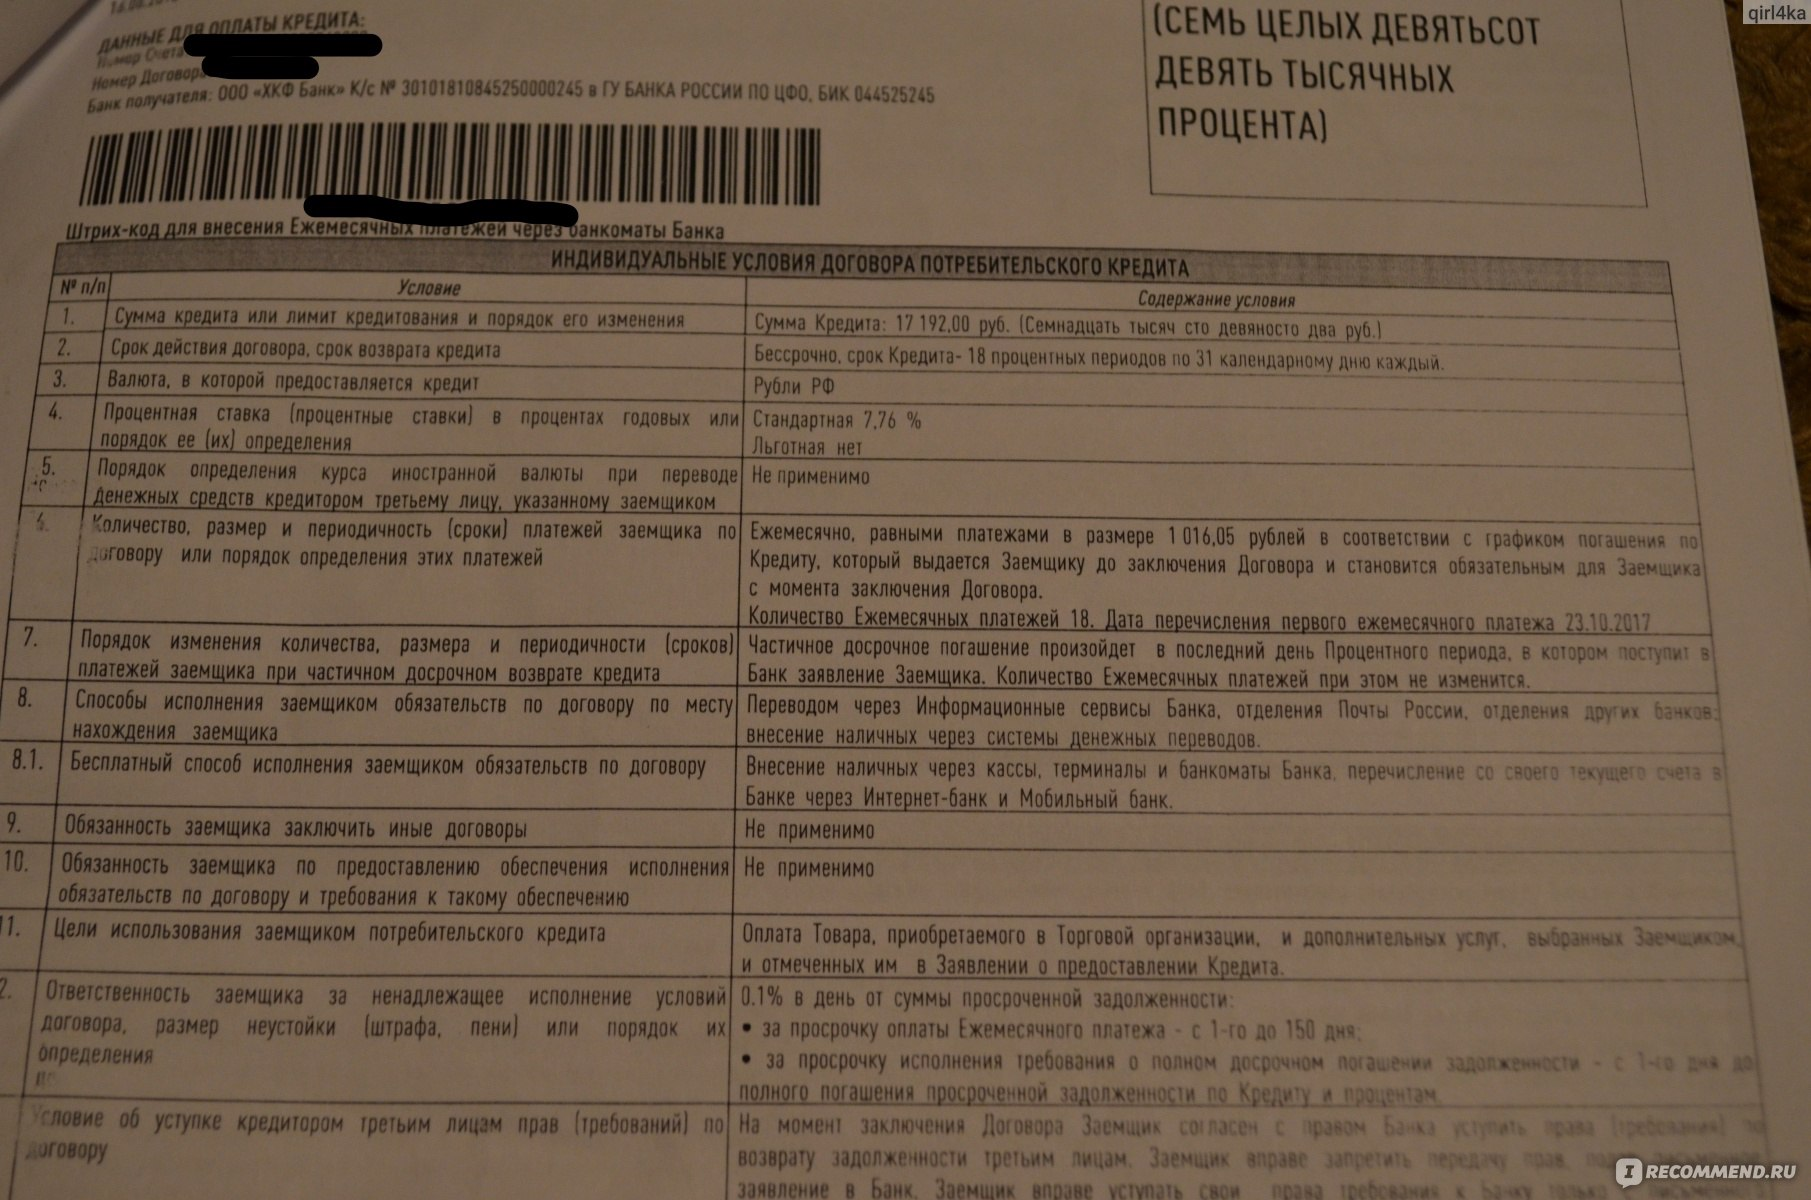 квартира в кредит киев без первого взноса